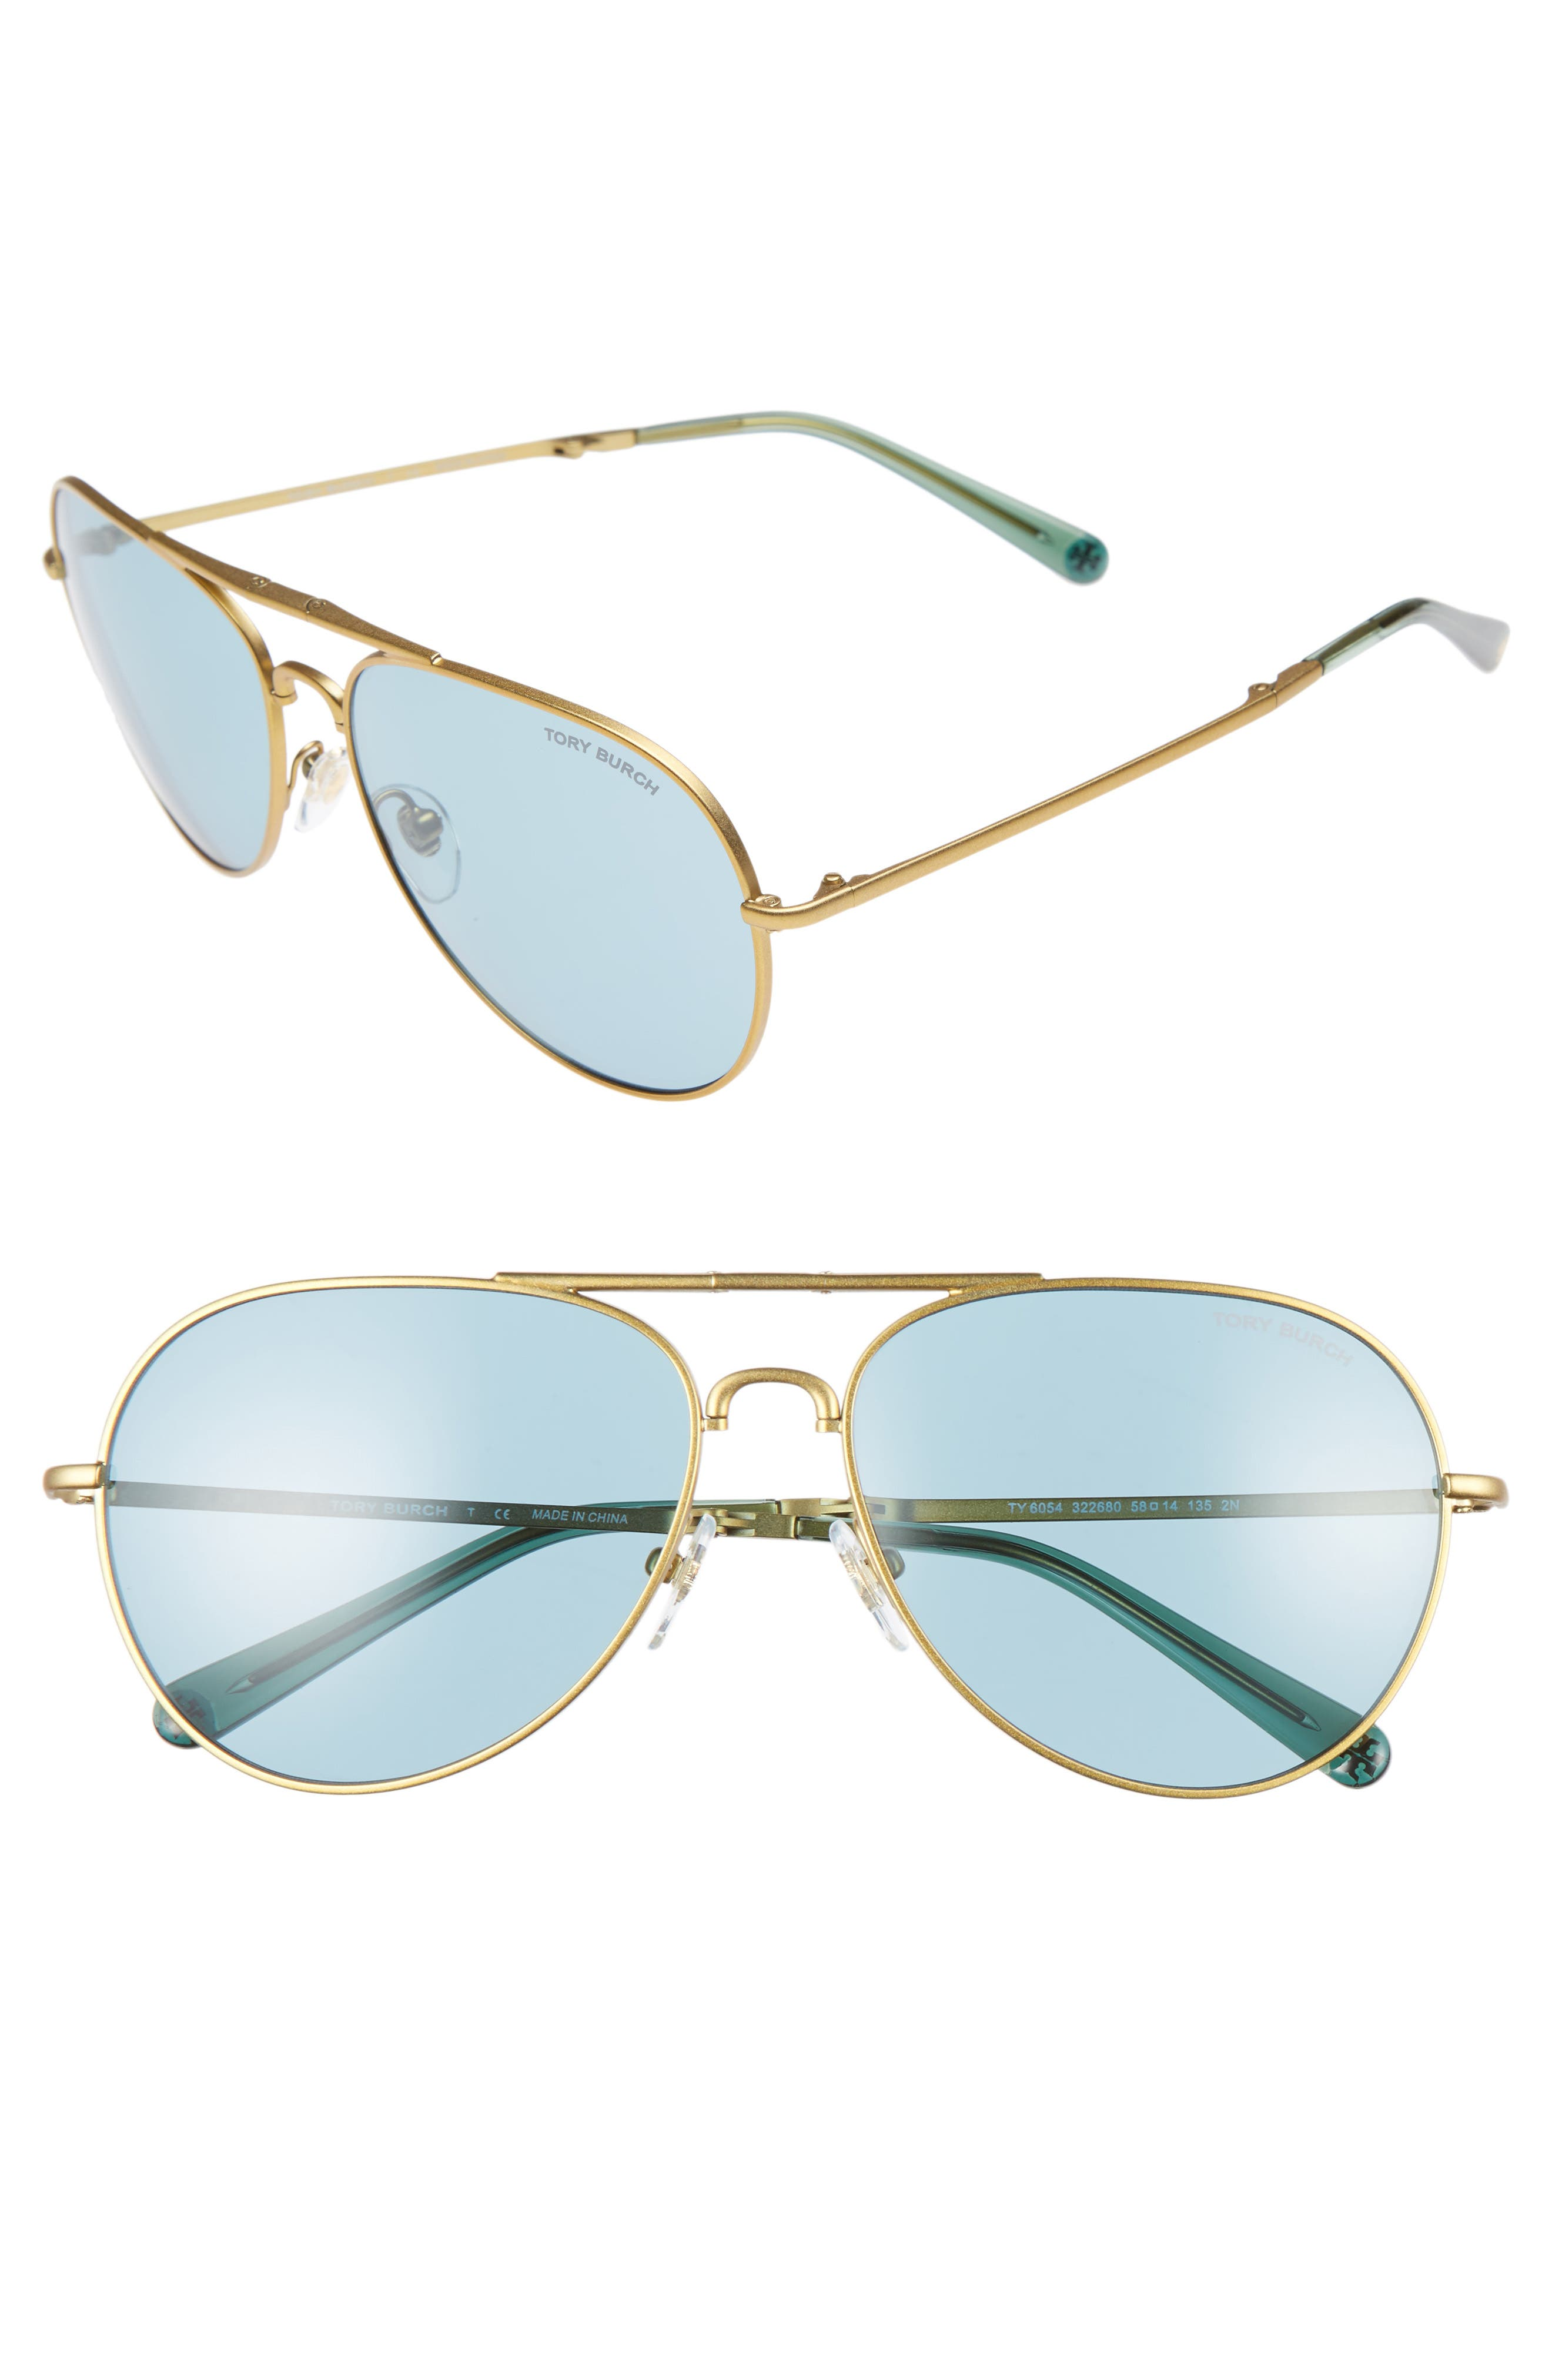 58mm Foldable Aviator Sunglasses,                         Main,                         color, 710